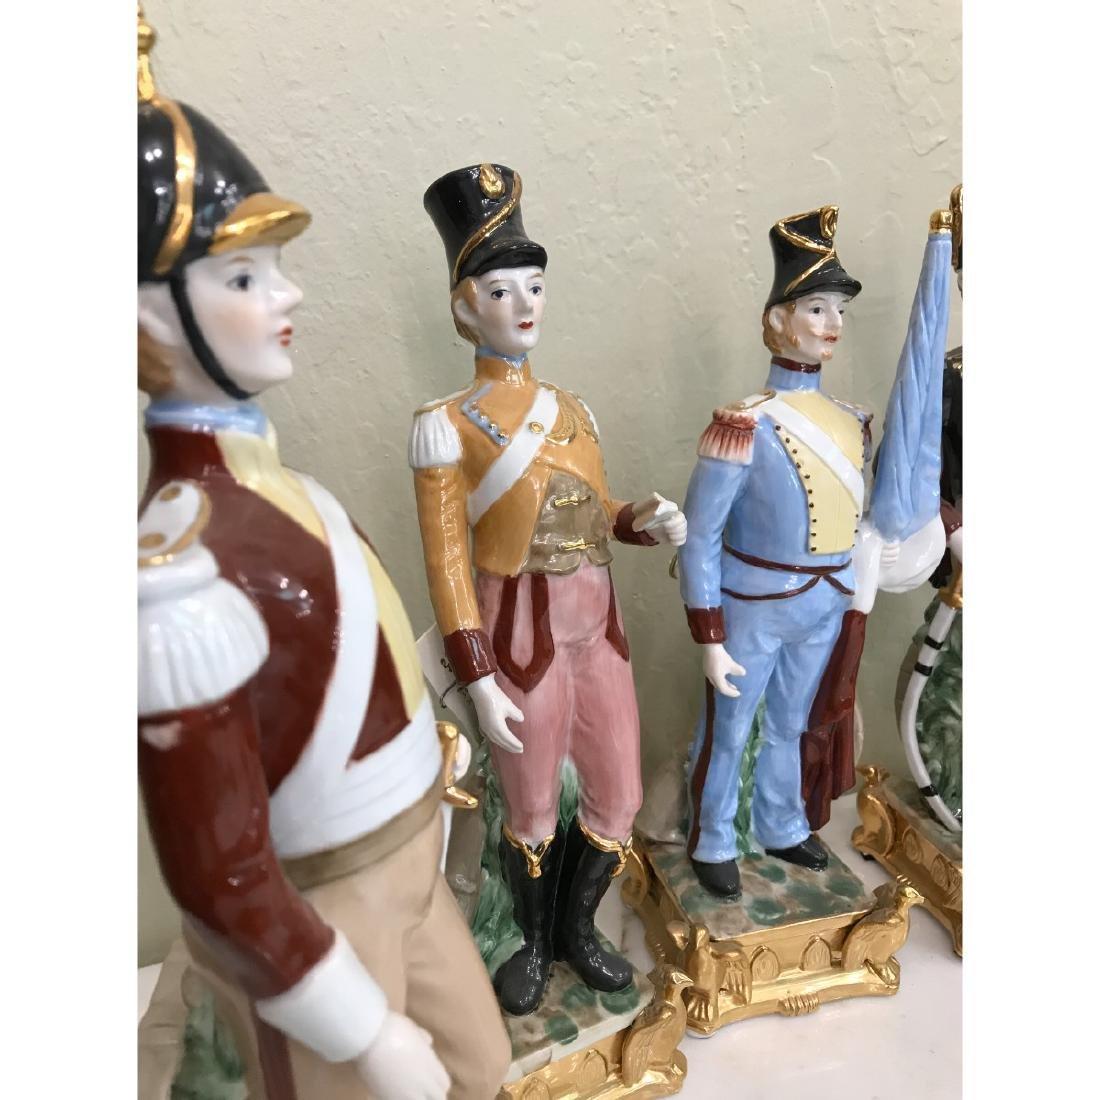 Set of 5 Porcelain Soldier Statues - 3